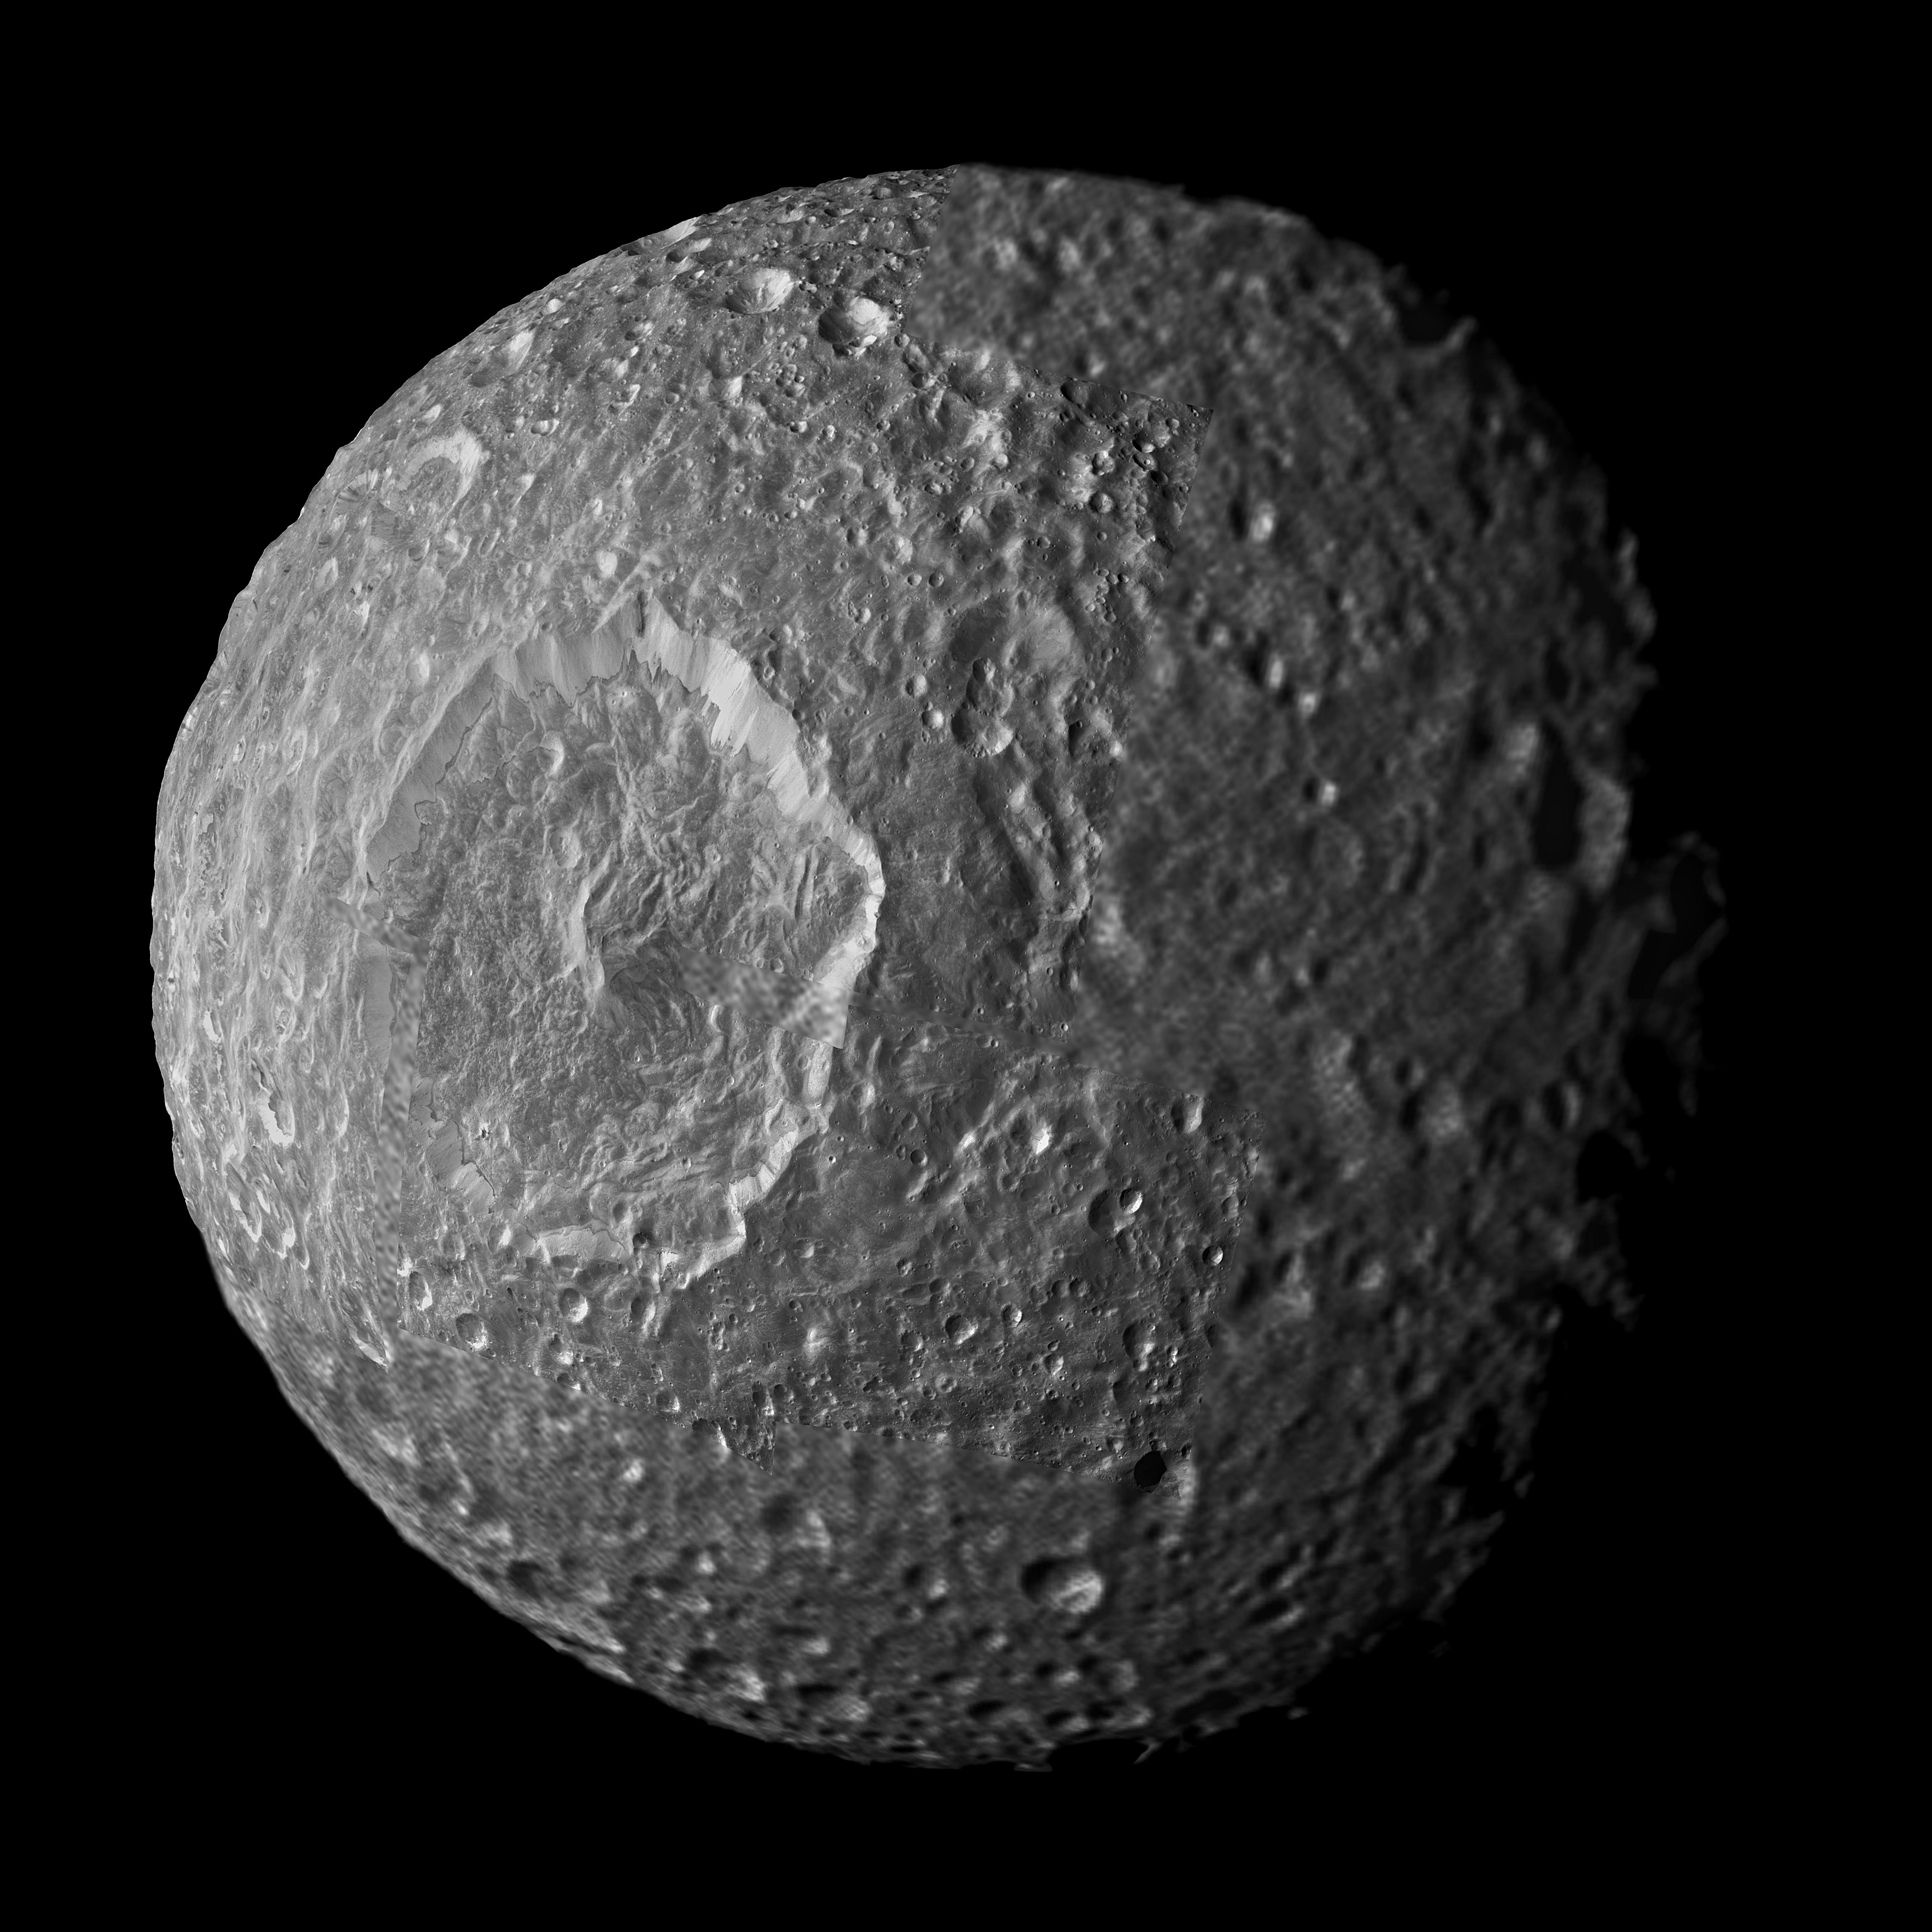 Nasa Streaks And Markings On Mimas